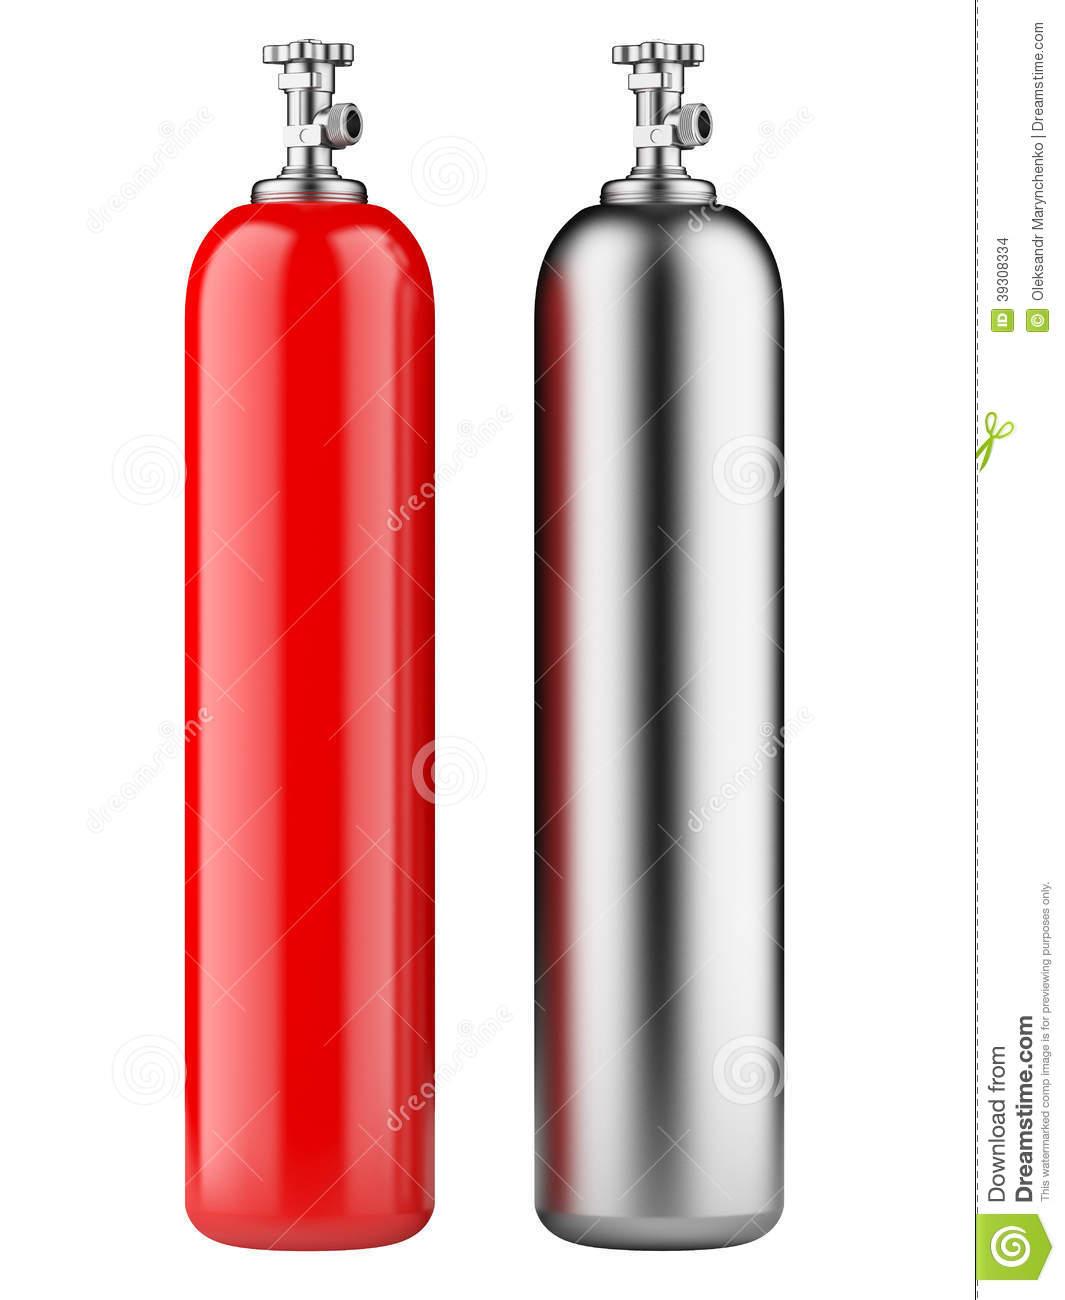 Oxygen gas cylinder clipart.